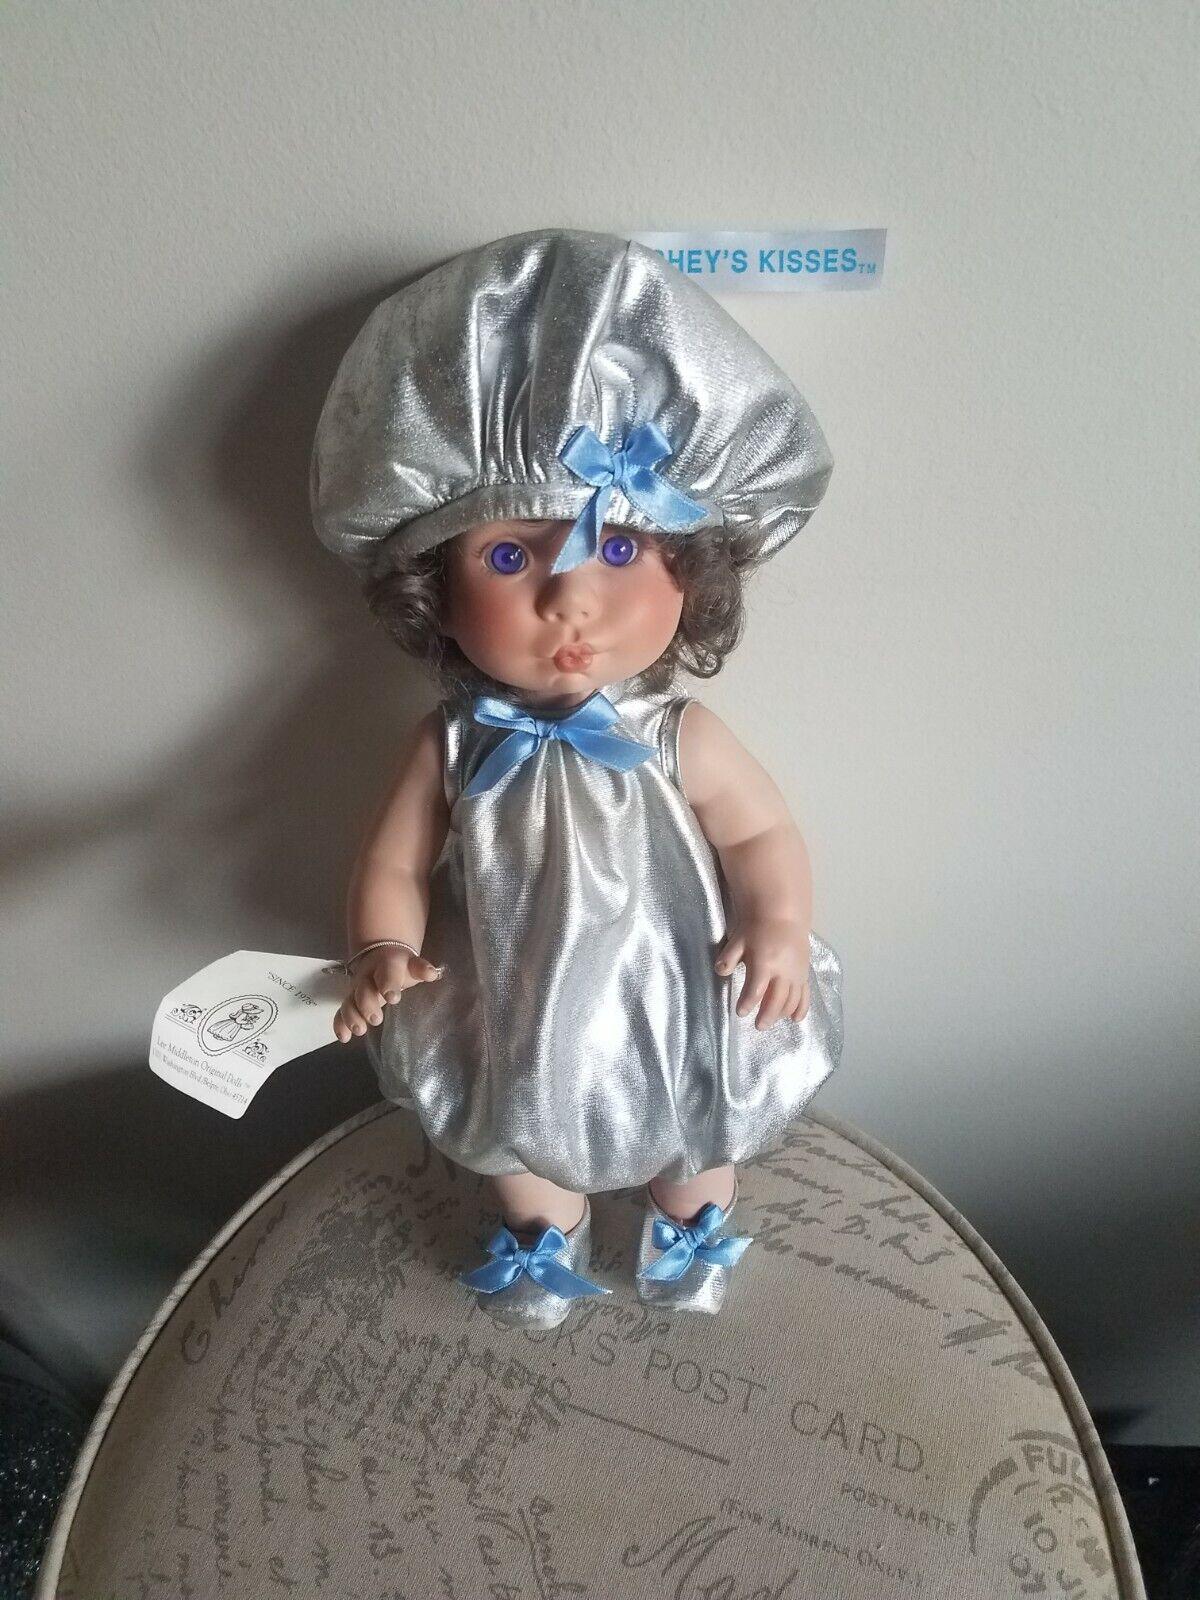 1994 Lee Middleton Hershey s Kisses Vinyl Doll Number 1152 W/ COA Box Tags - $30.00